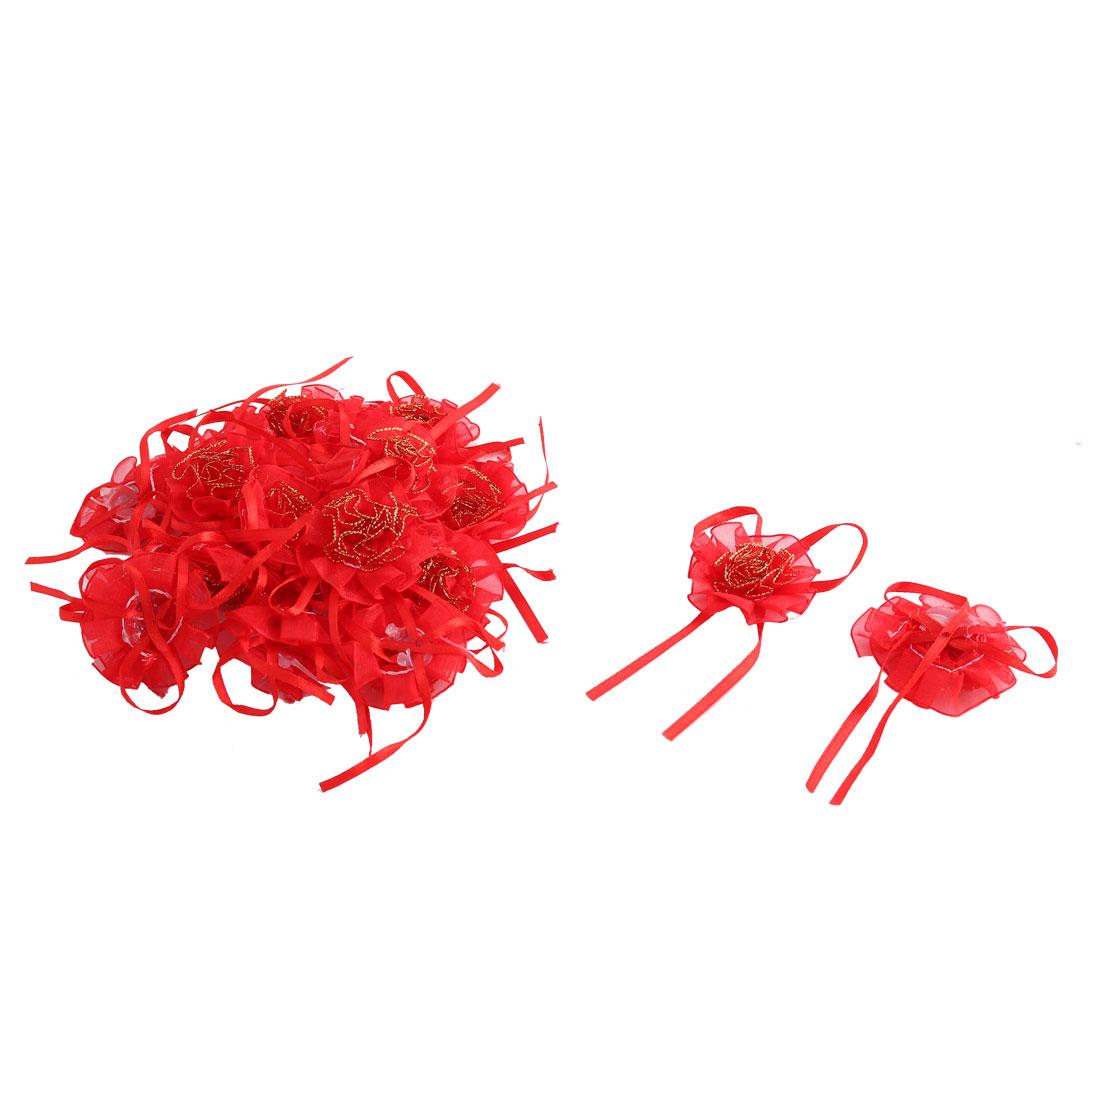 Home Wedding Party Decor Organza Emulational Handcraft DIY Flower Red 20 Pcs